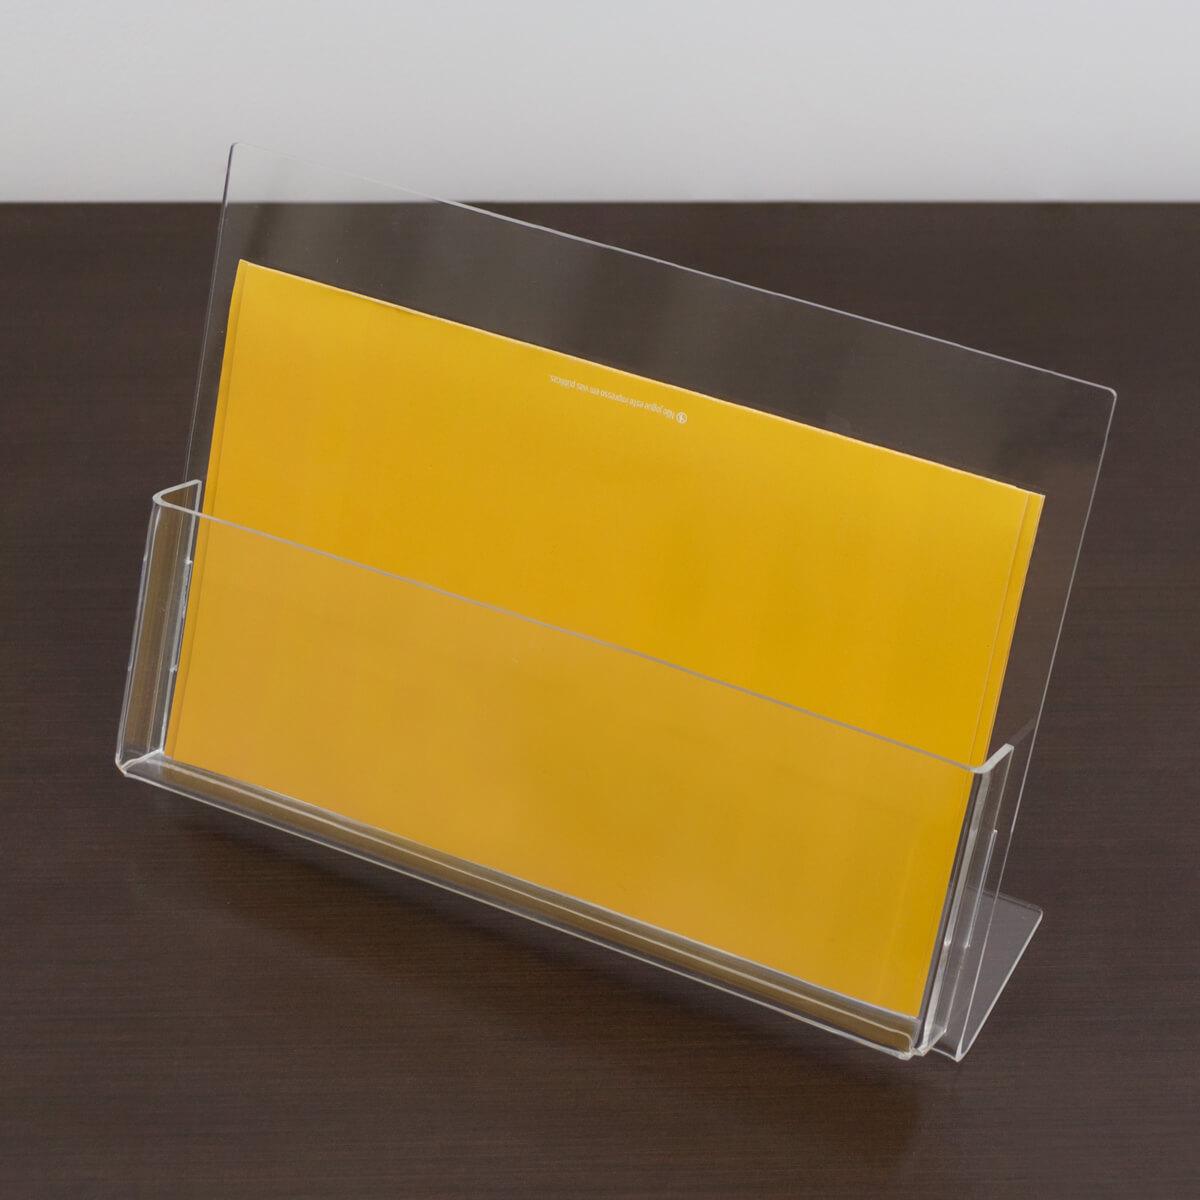 Porta folder a5 de acrílico